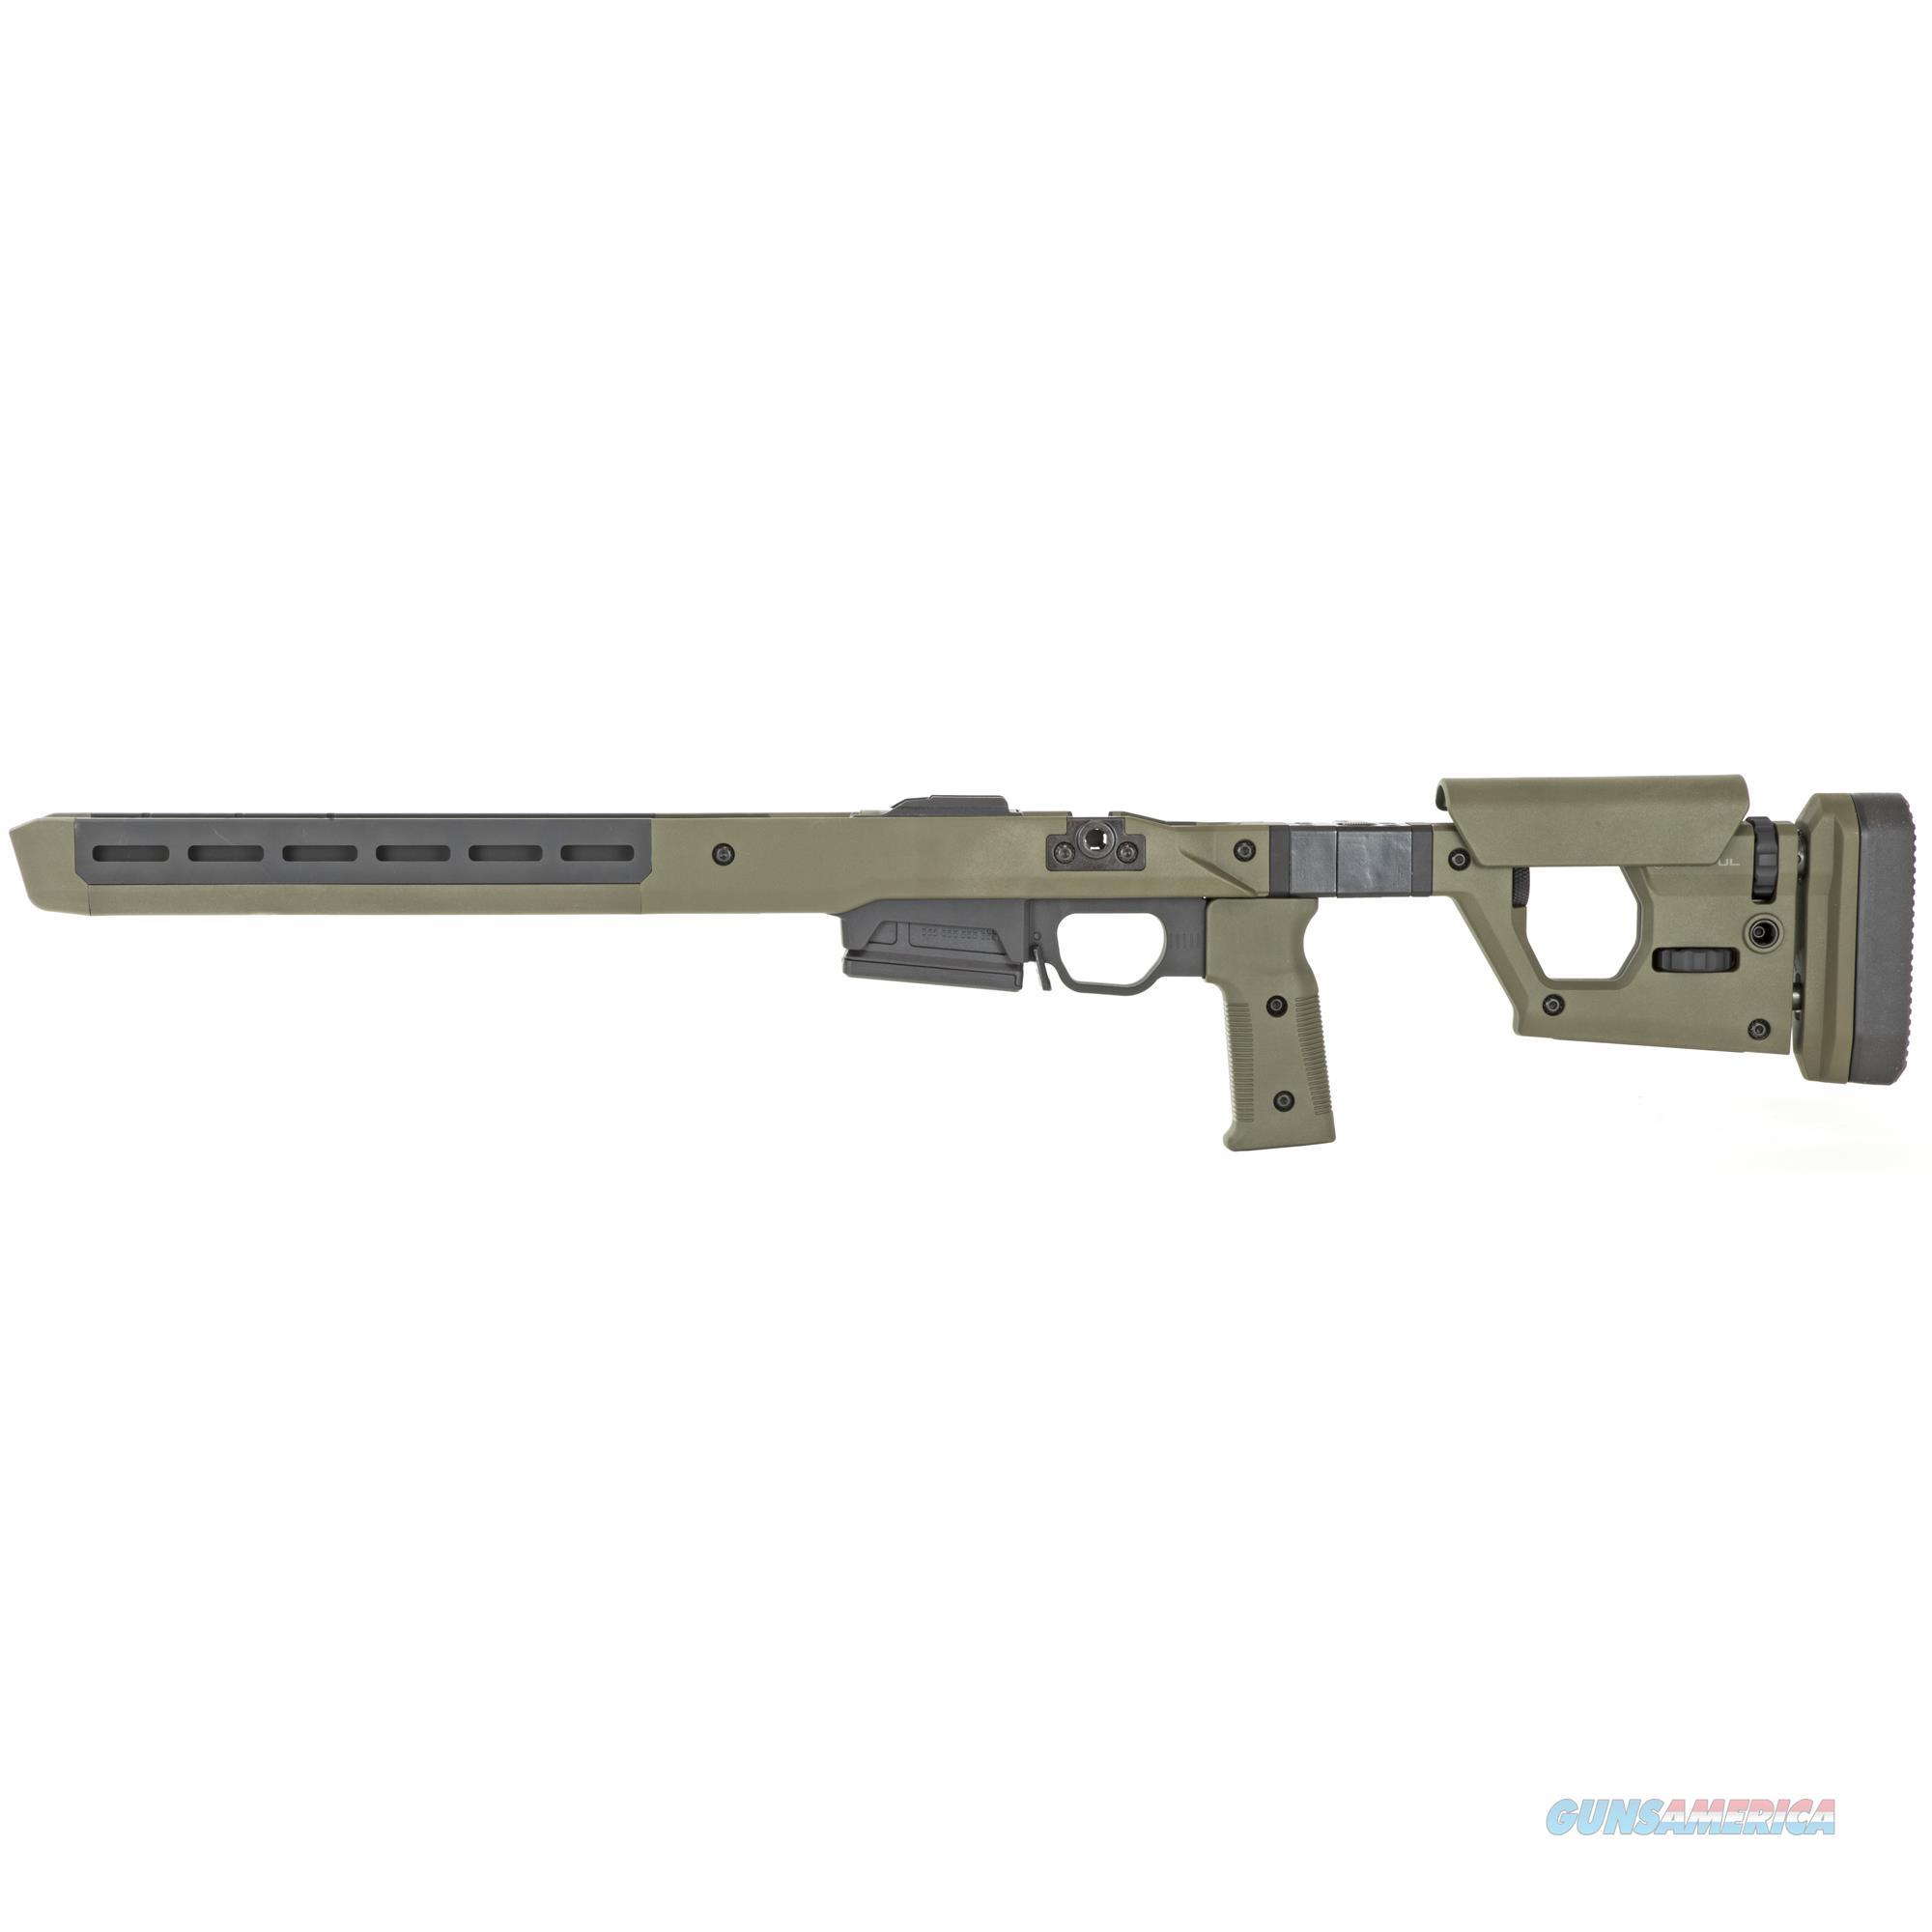 Magpul Industries, PRO 700 Stock, Fits Remington 700 Short Action, OD Green Finish MAG802-ODG  Non-Guns > Gun Parts > Rifle/Accuracy/Sniper